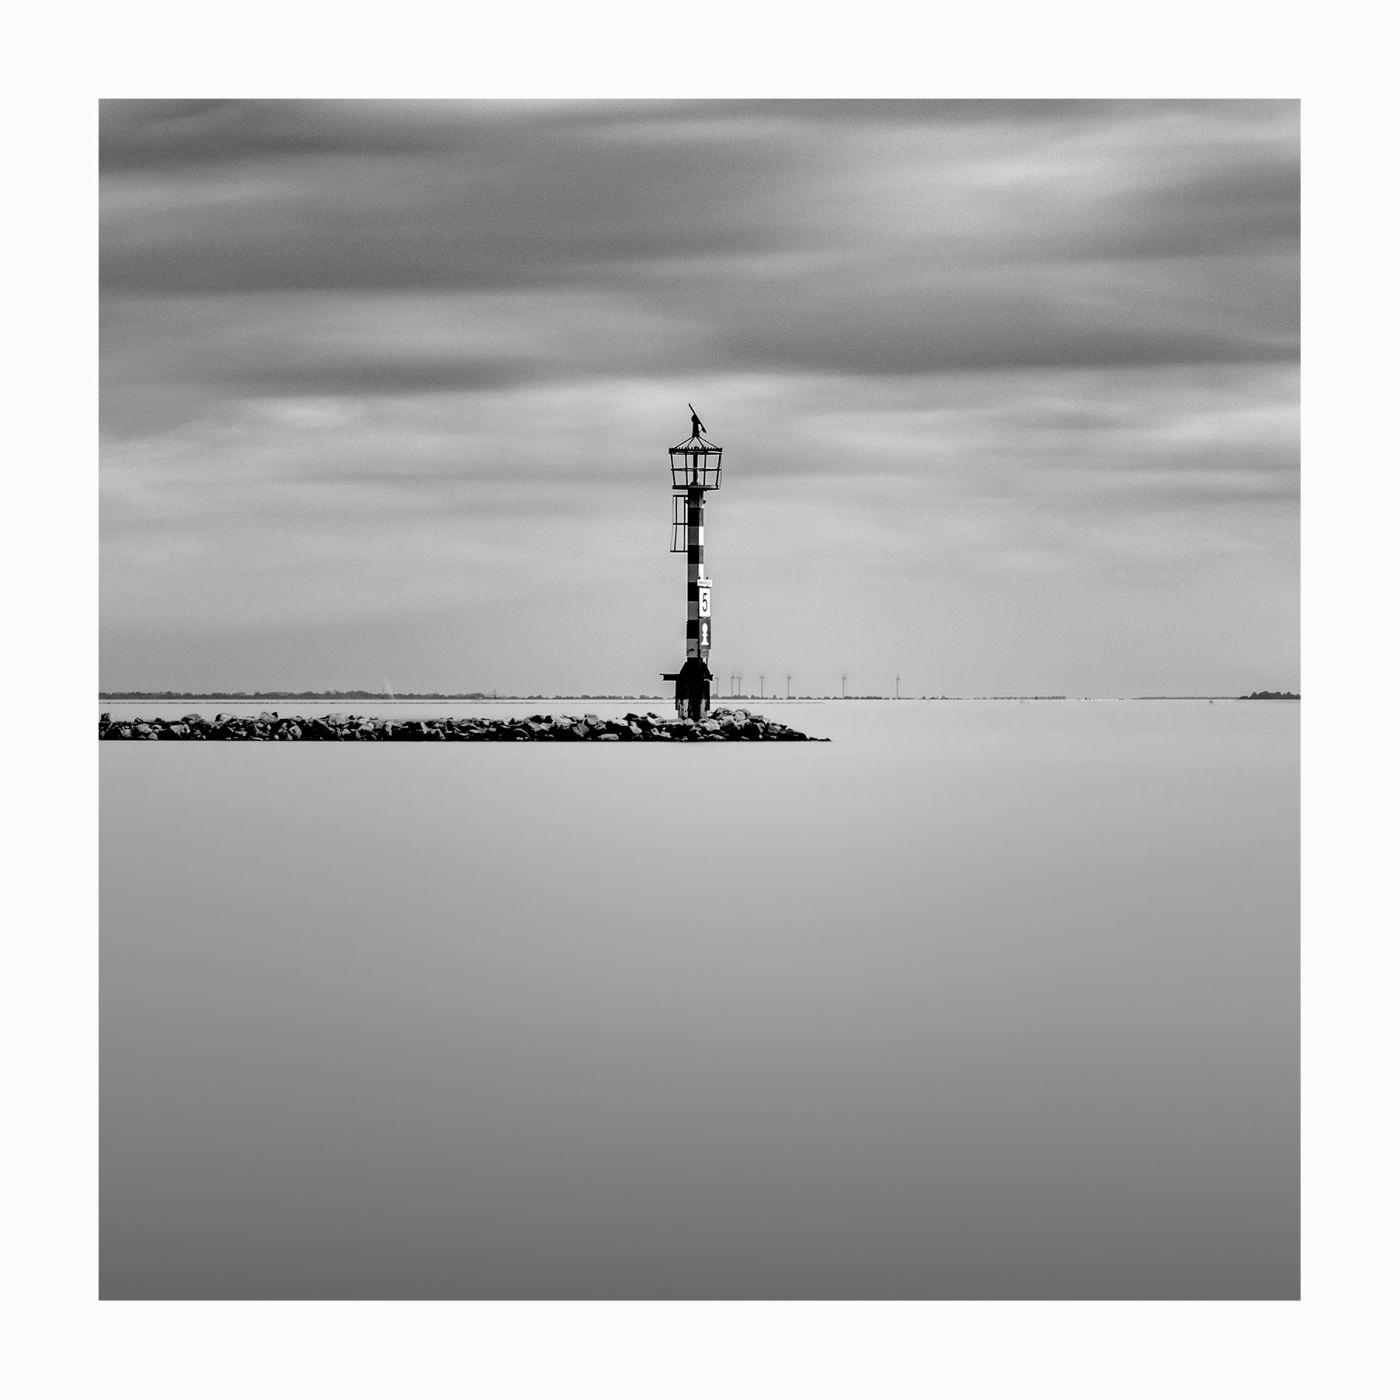 Tower 5, Netherlands